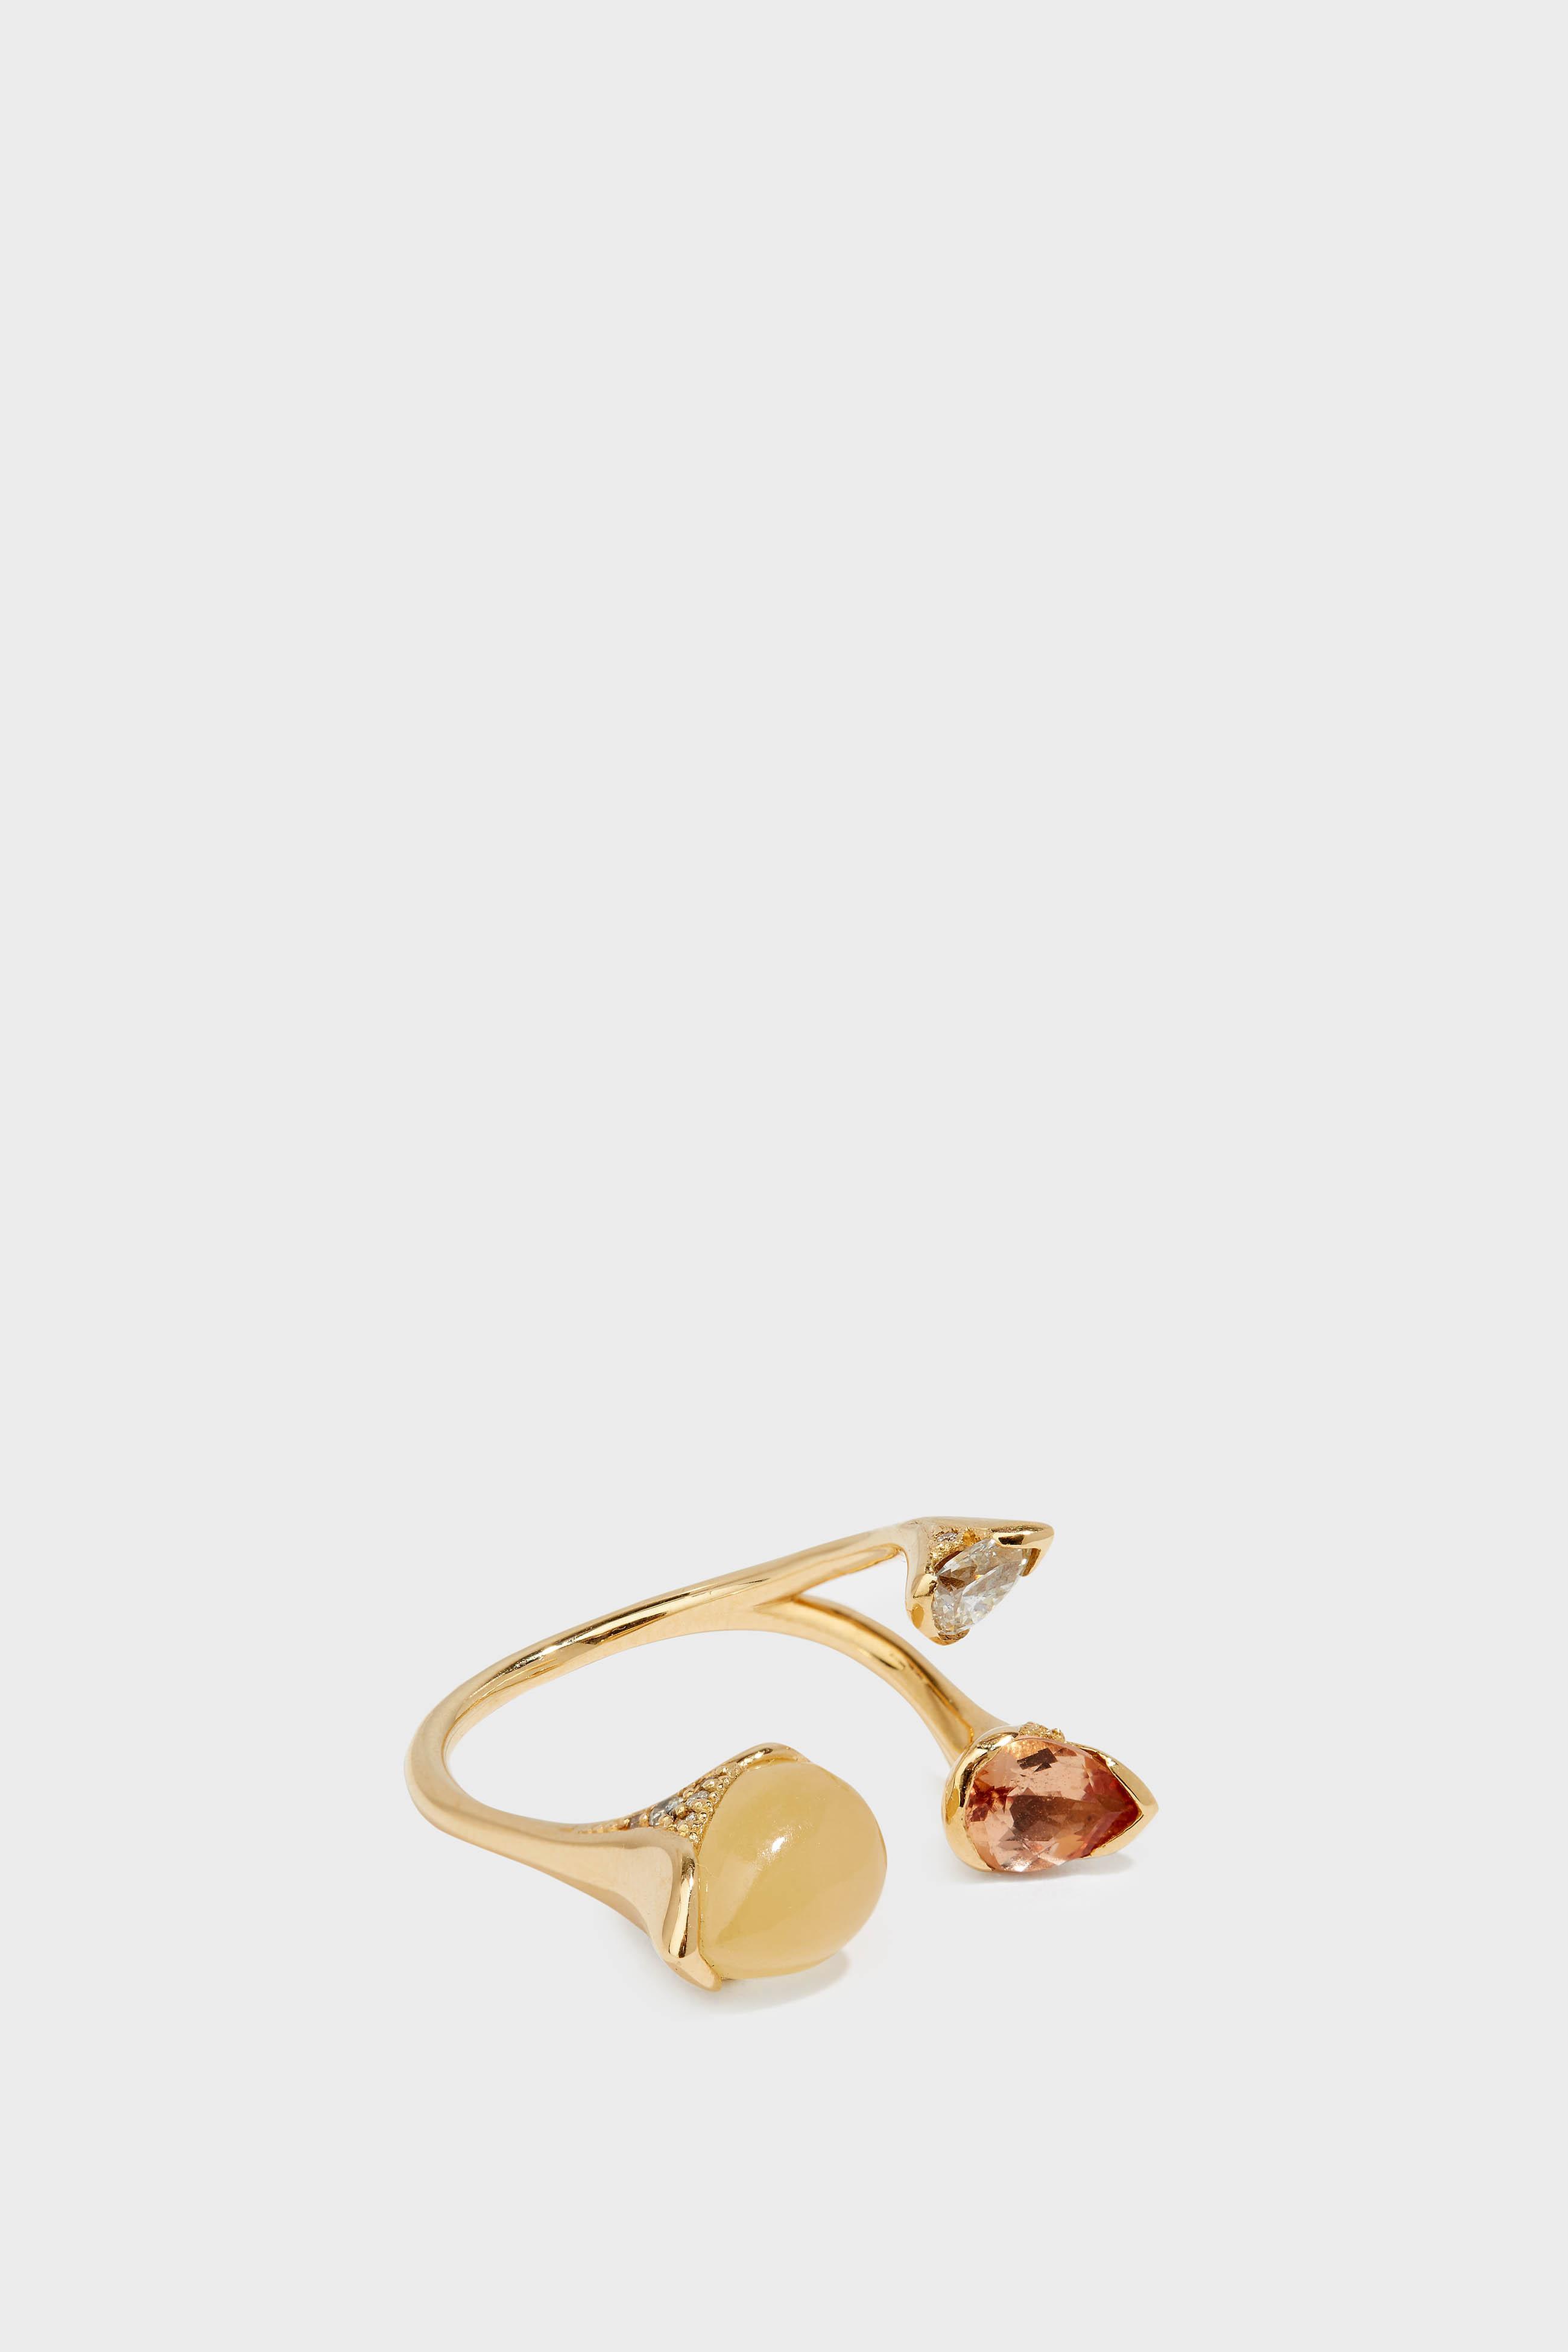 FERNANDO JORGE 18-KARAT GOLD DIAMOND, IMPERIAL TOPAZ AND CALCITE RING